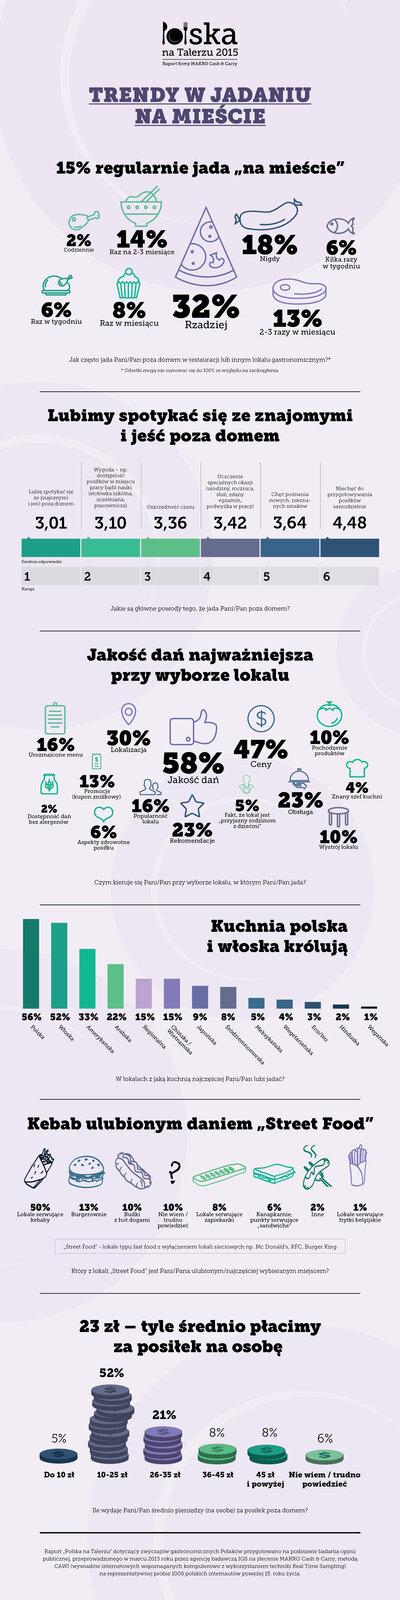 Polska na Talerzu 2015_Trendy w jadaniu na mieście.jpg